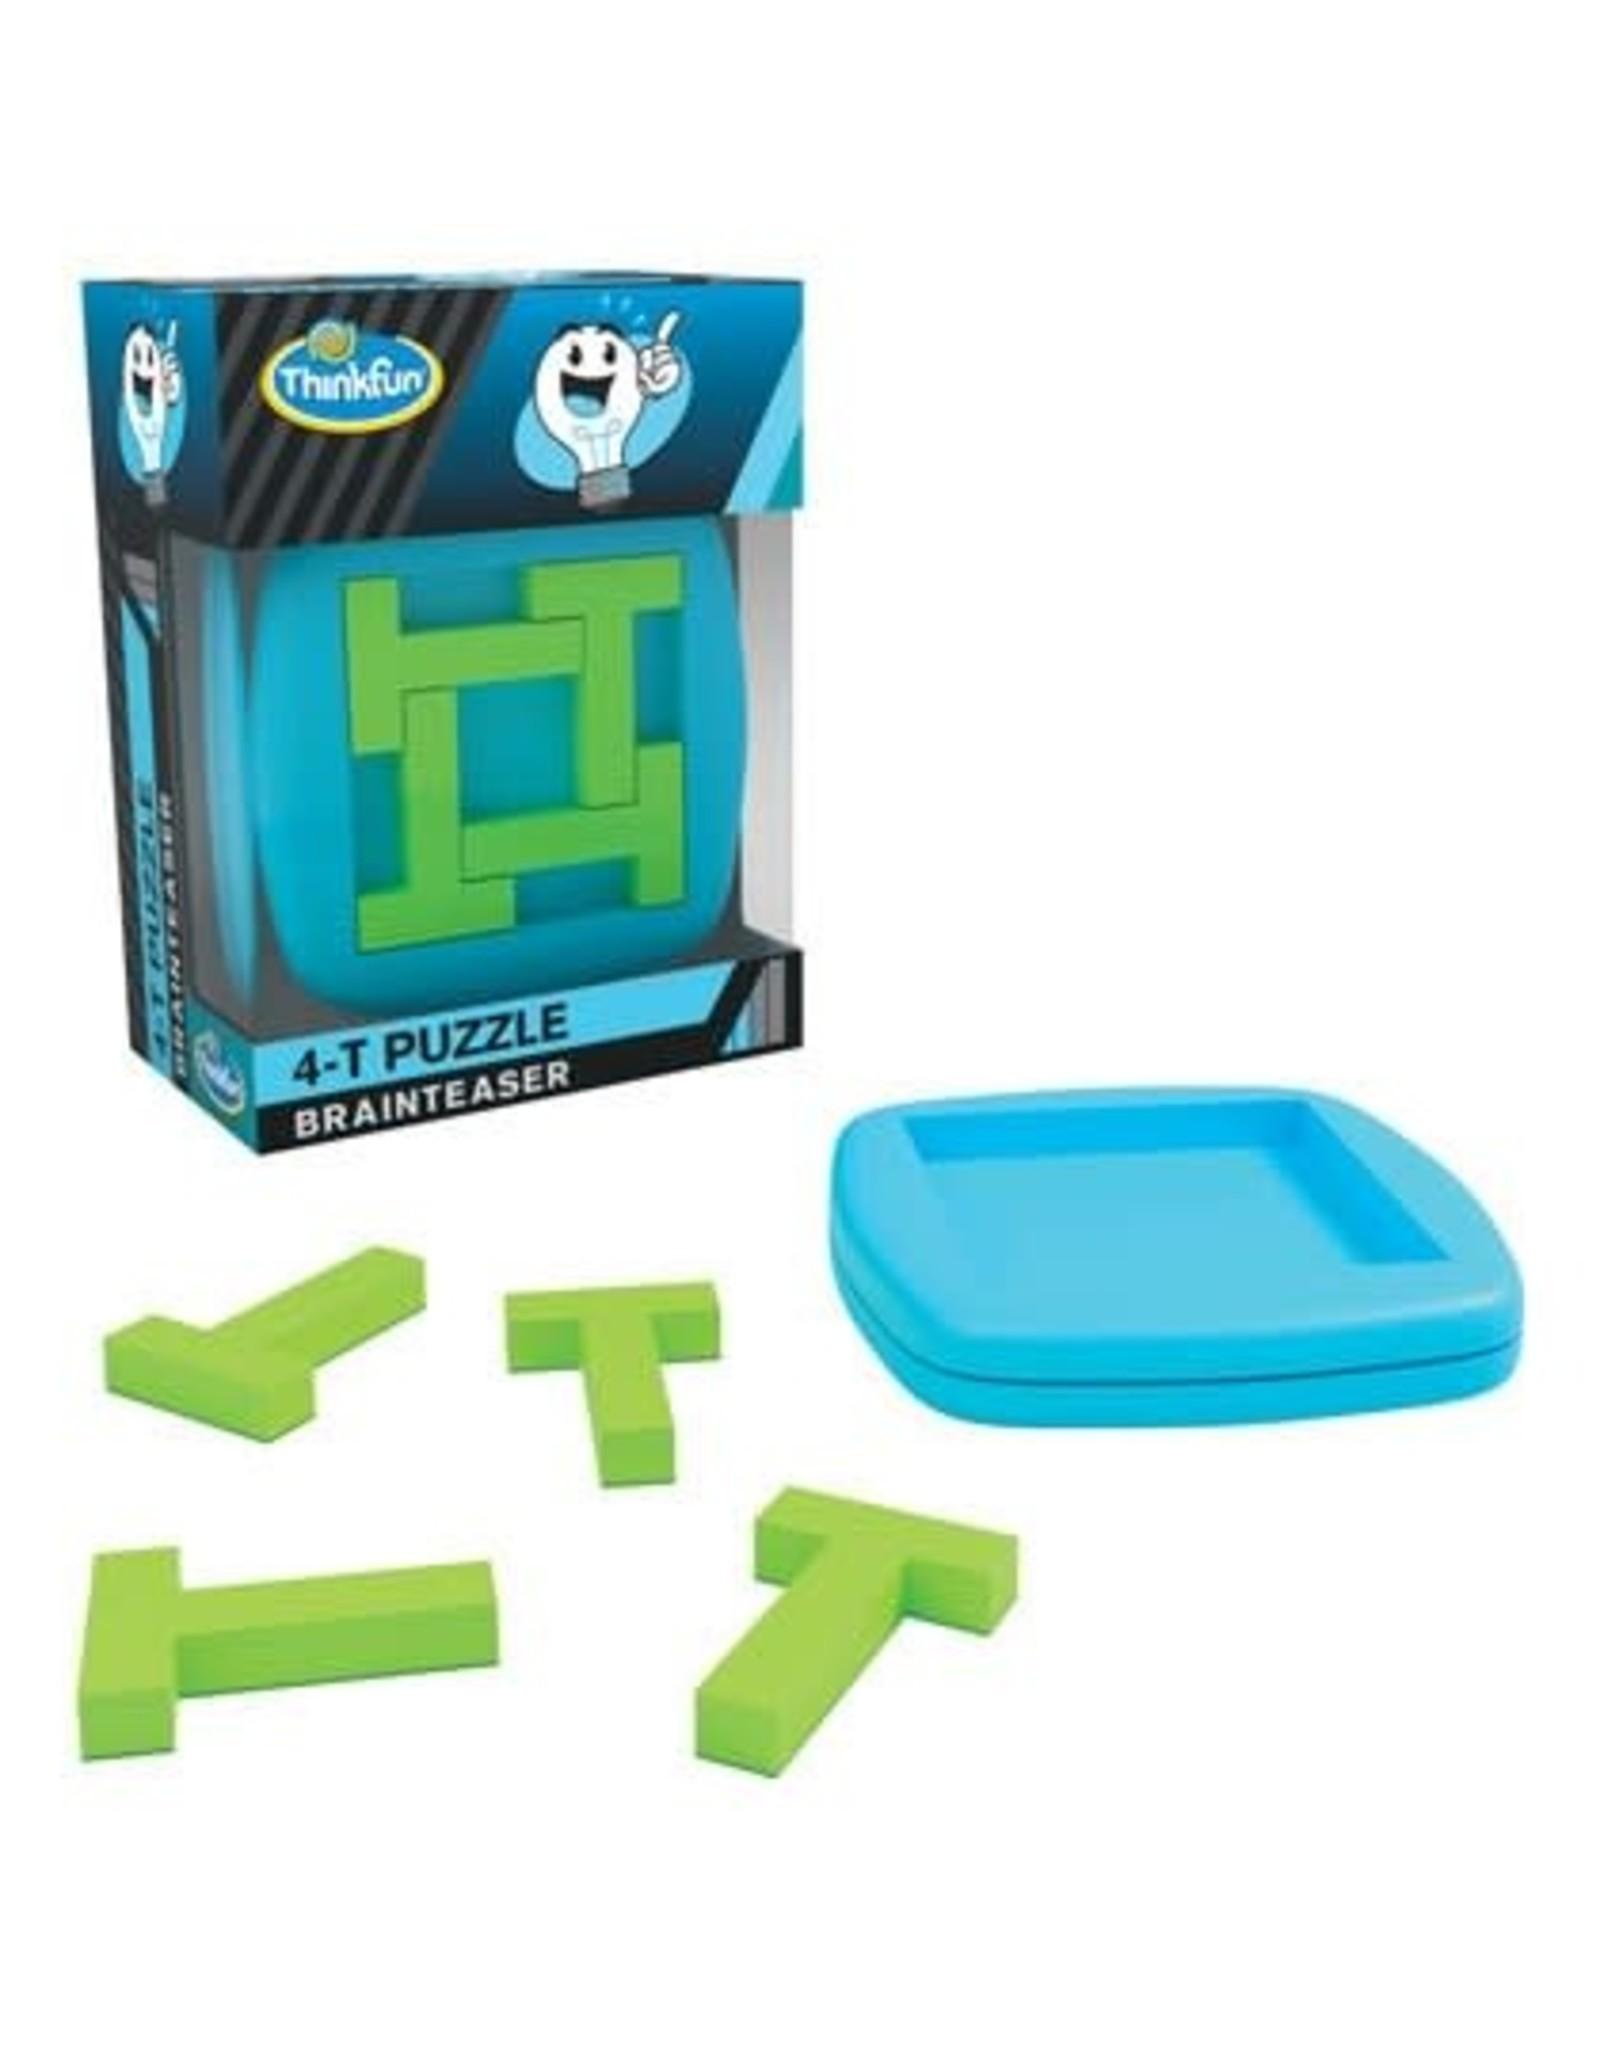 Thinkfun 4-T Puzzle Brainteaser